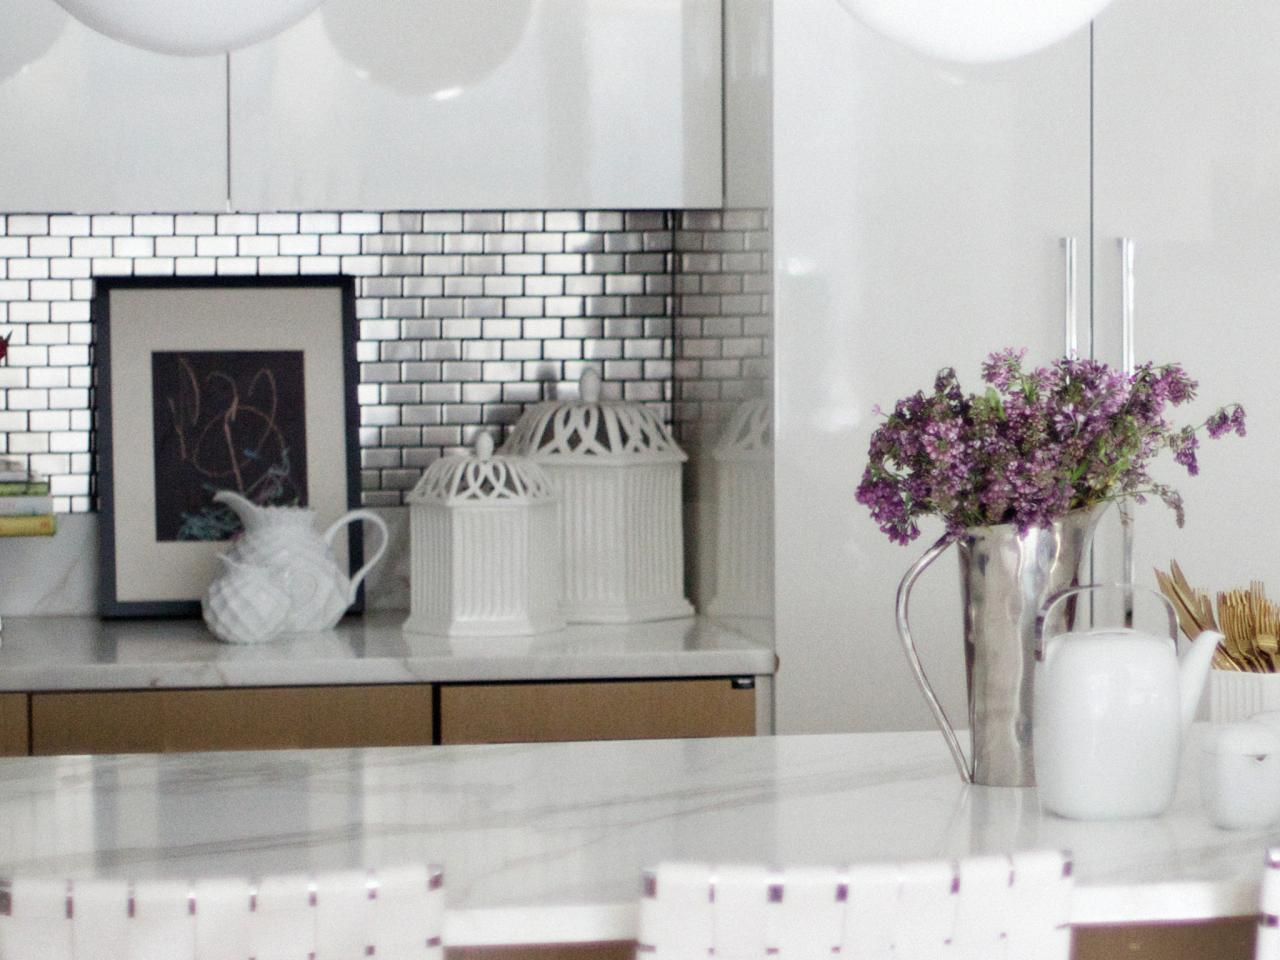 Adorable kitchen splashback made of stainless steel